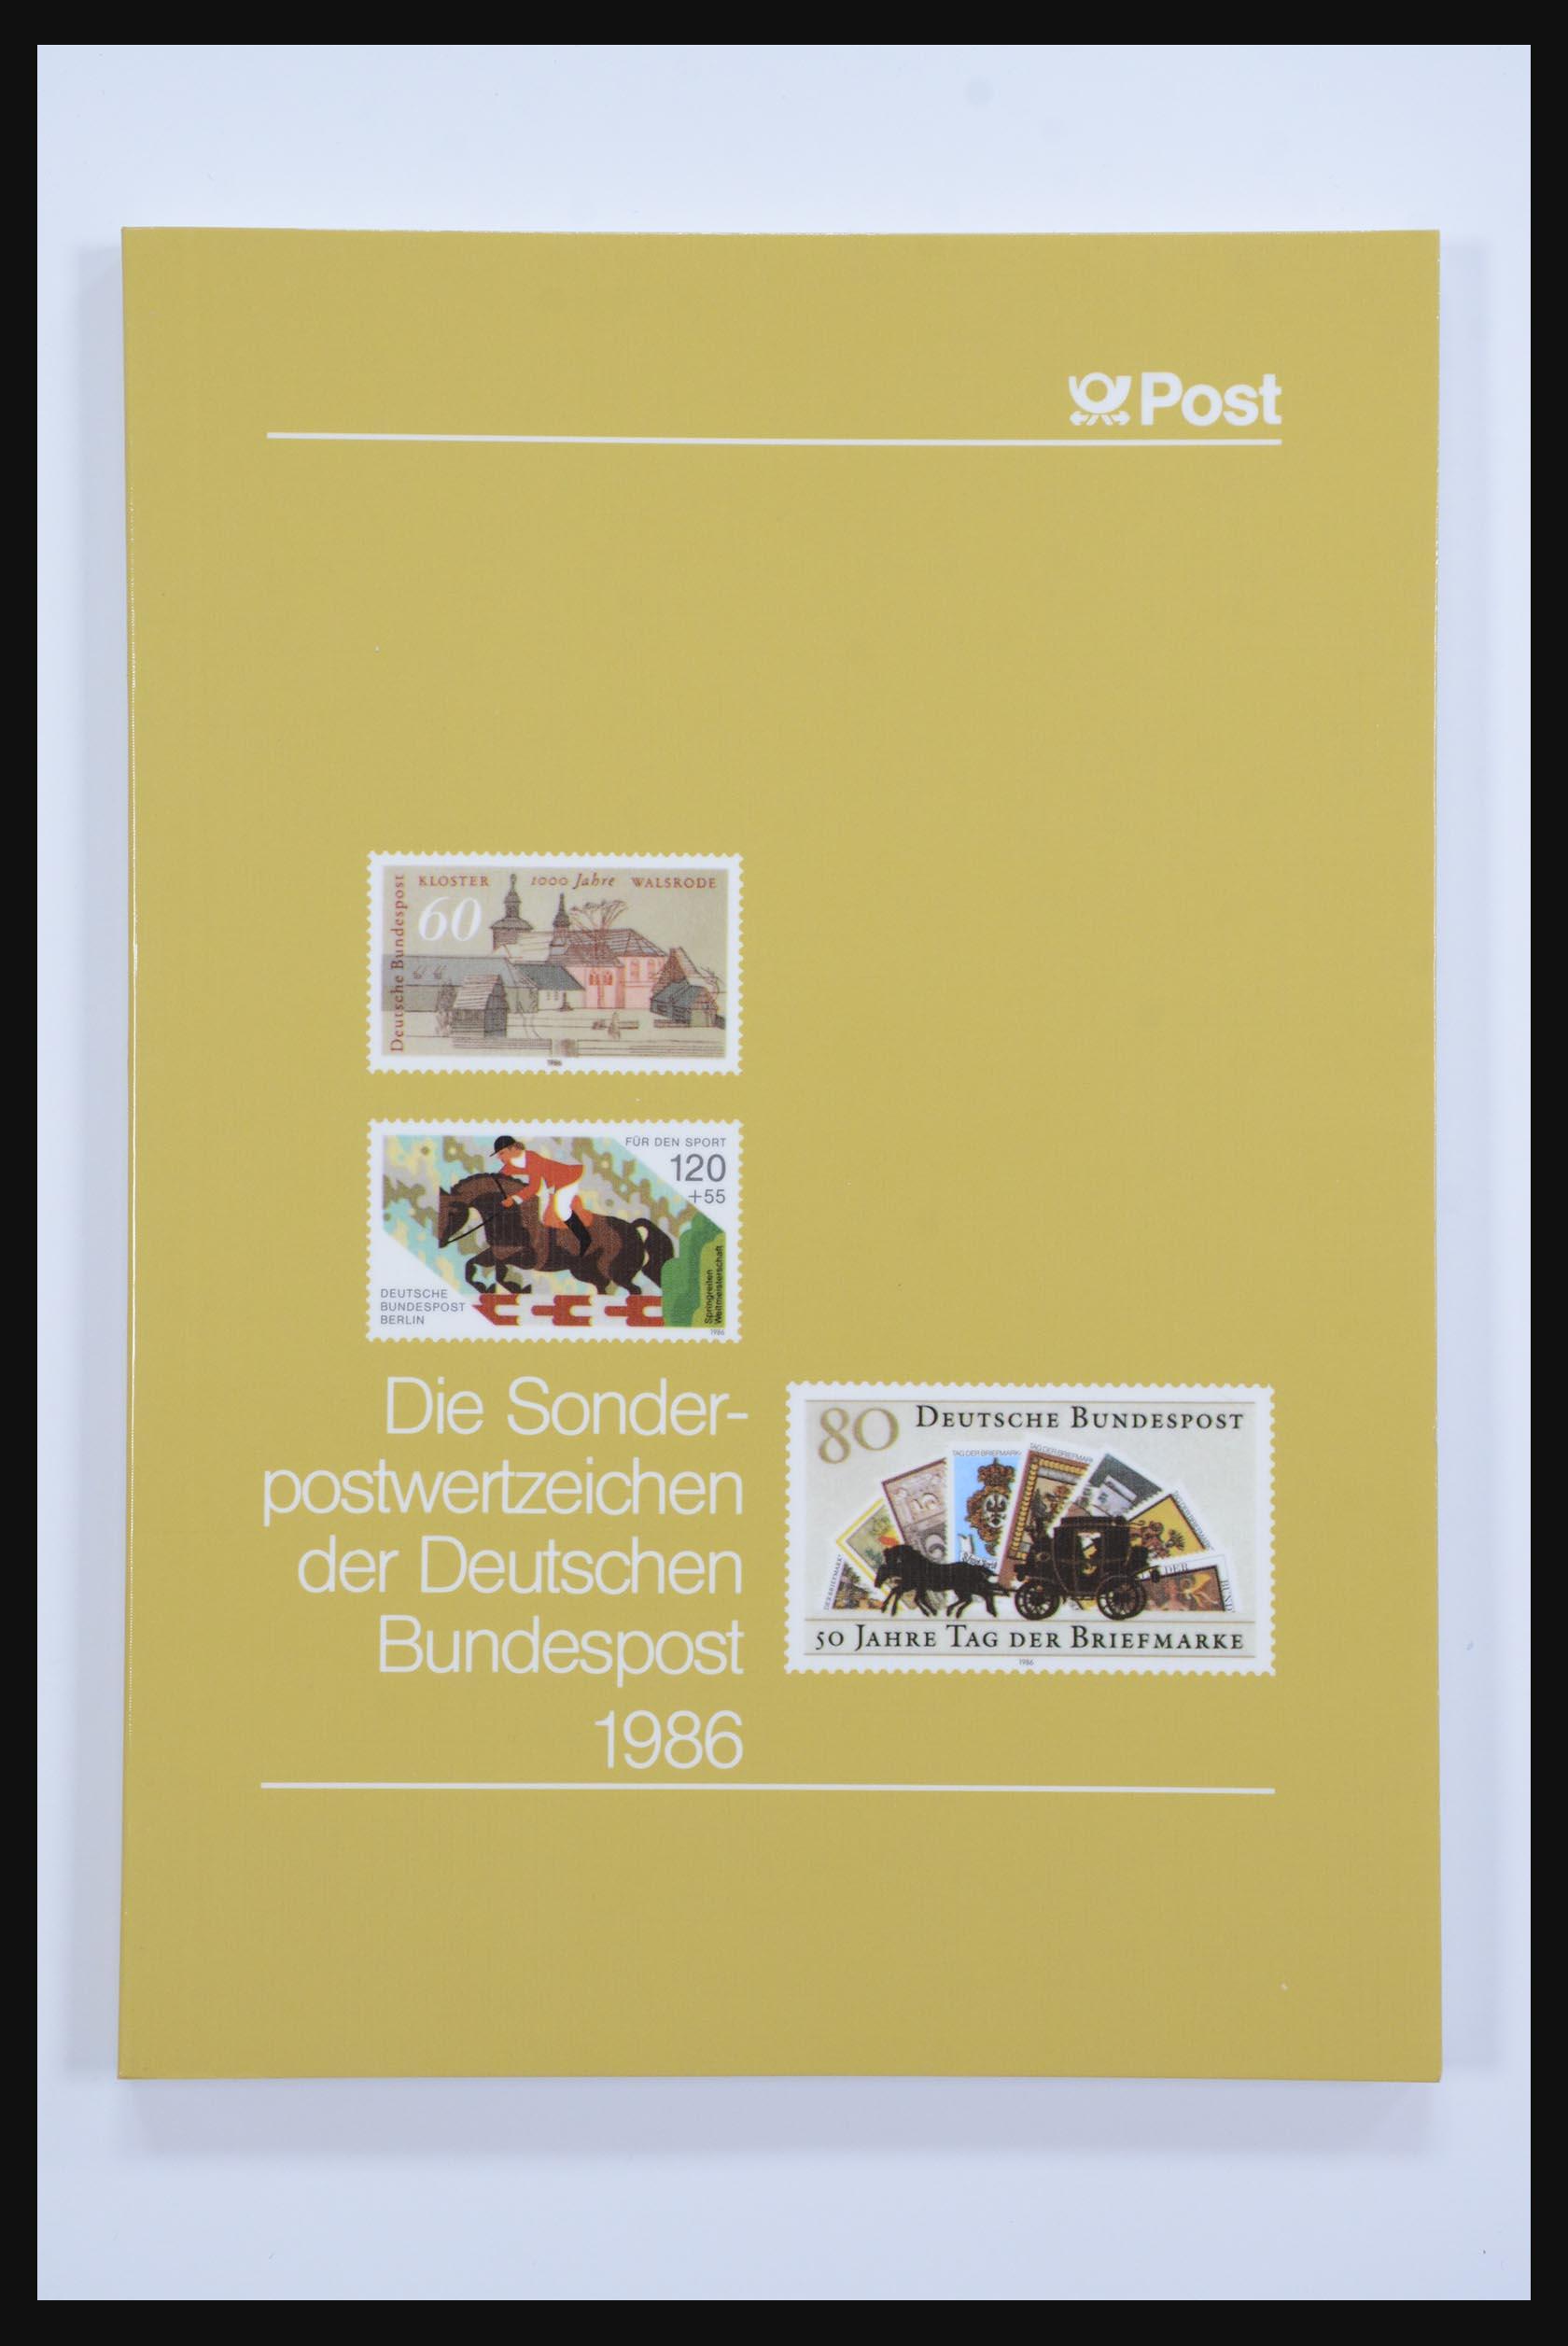 31834 014 - 31834 Bundespost yearbooks 1973(!)-1999.